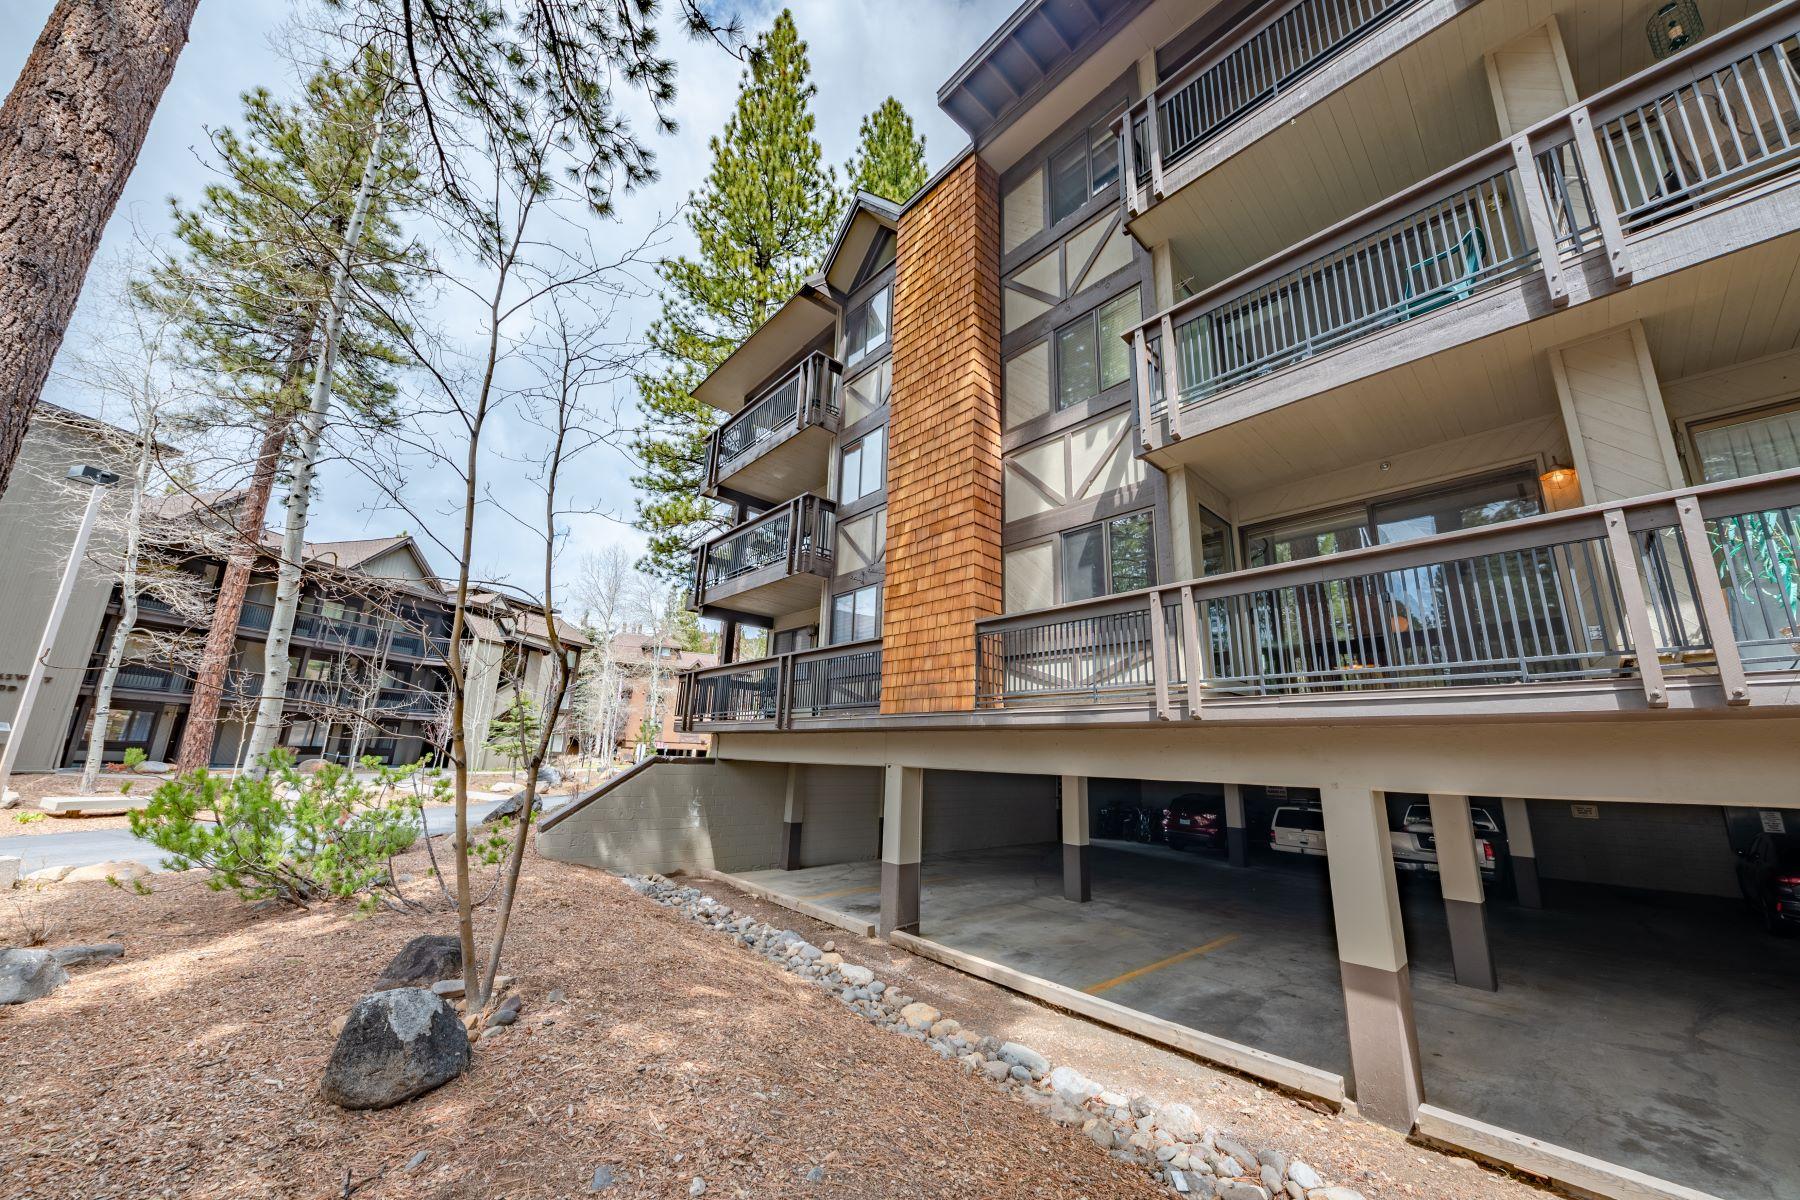 Additional photo for property listing at Ski Way Ridge Opportunity 333 Ski Way  #254 Incline Village, Nevada 89451 United States